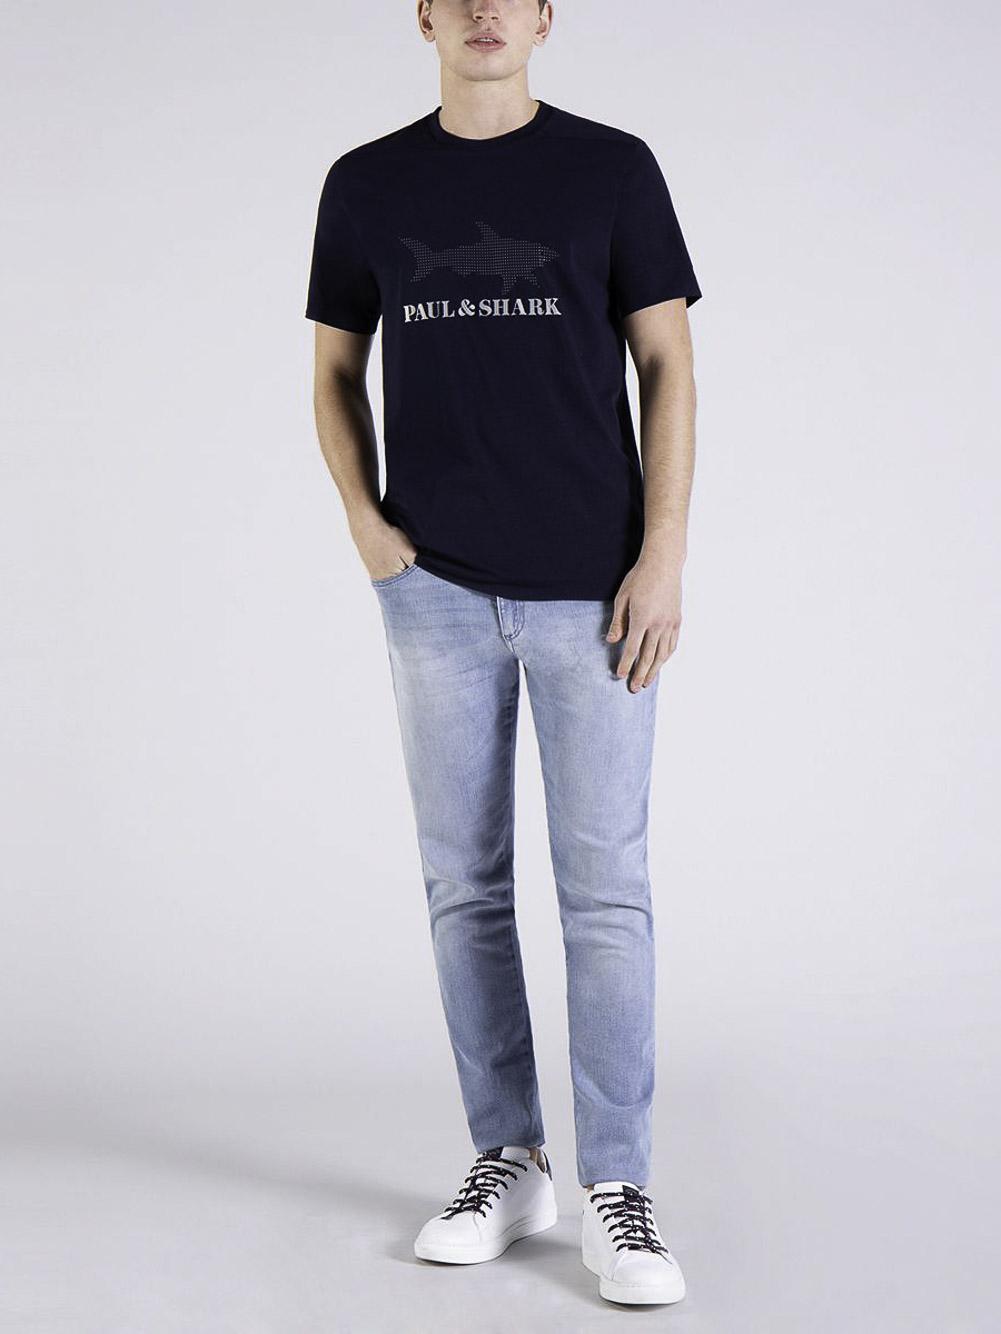 PAUL & SHARK Μπλούζα T-Shirt 21411019-013 ΜΠΛΕ